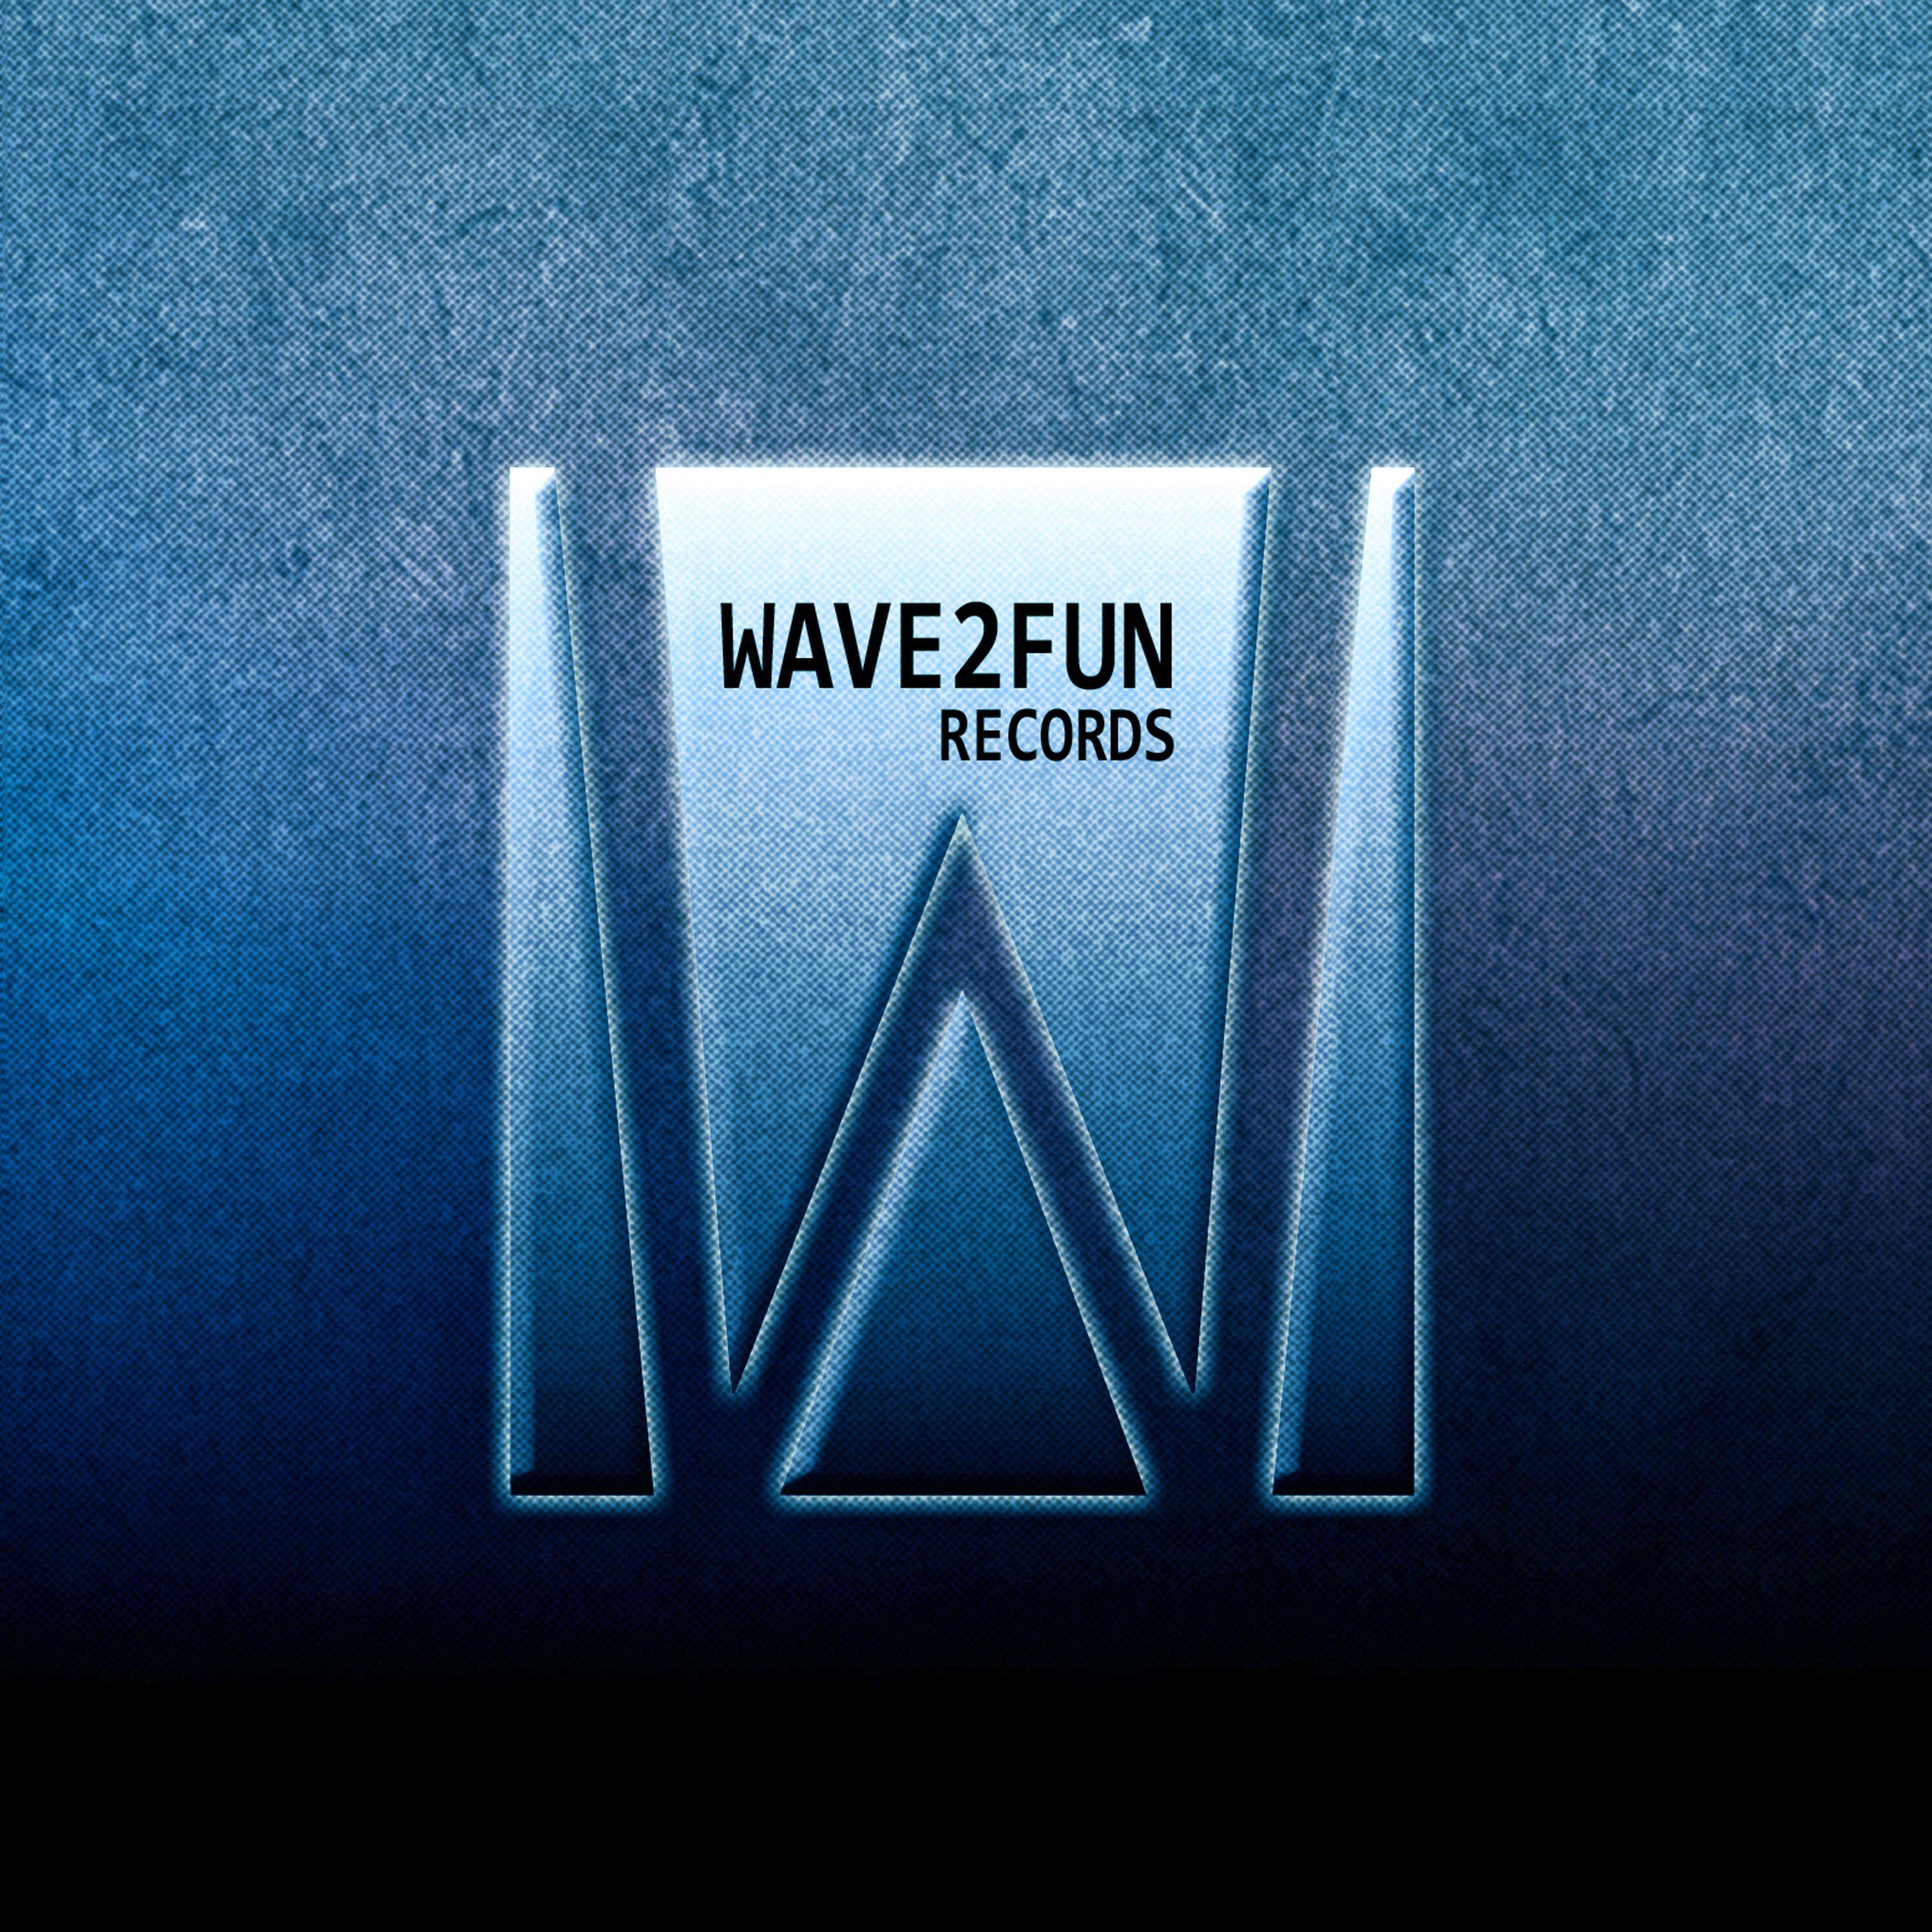 Wave2fun Records